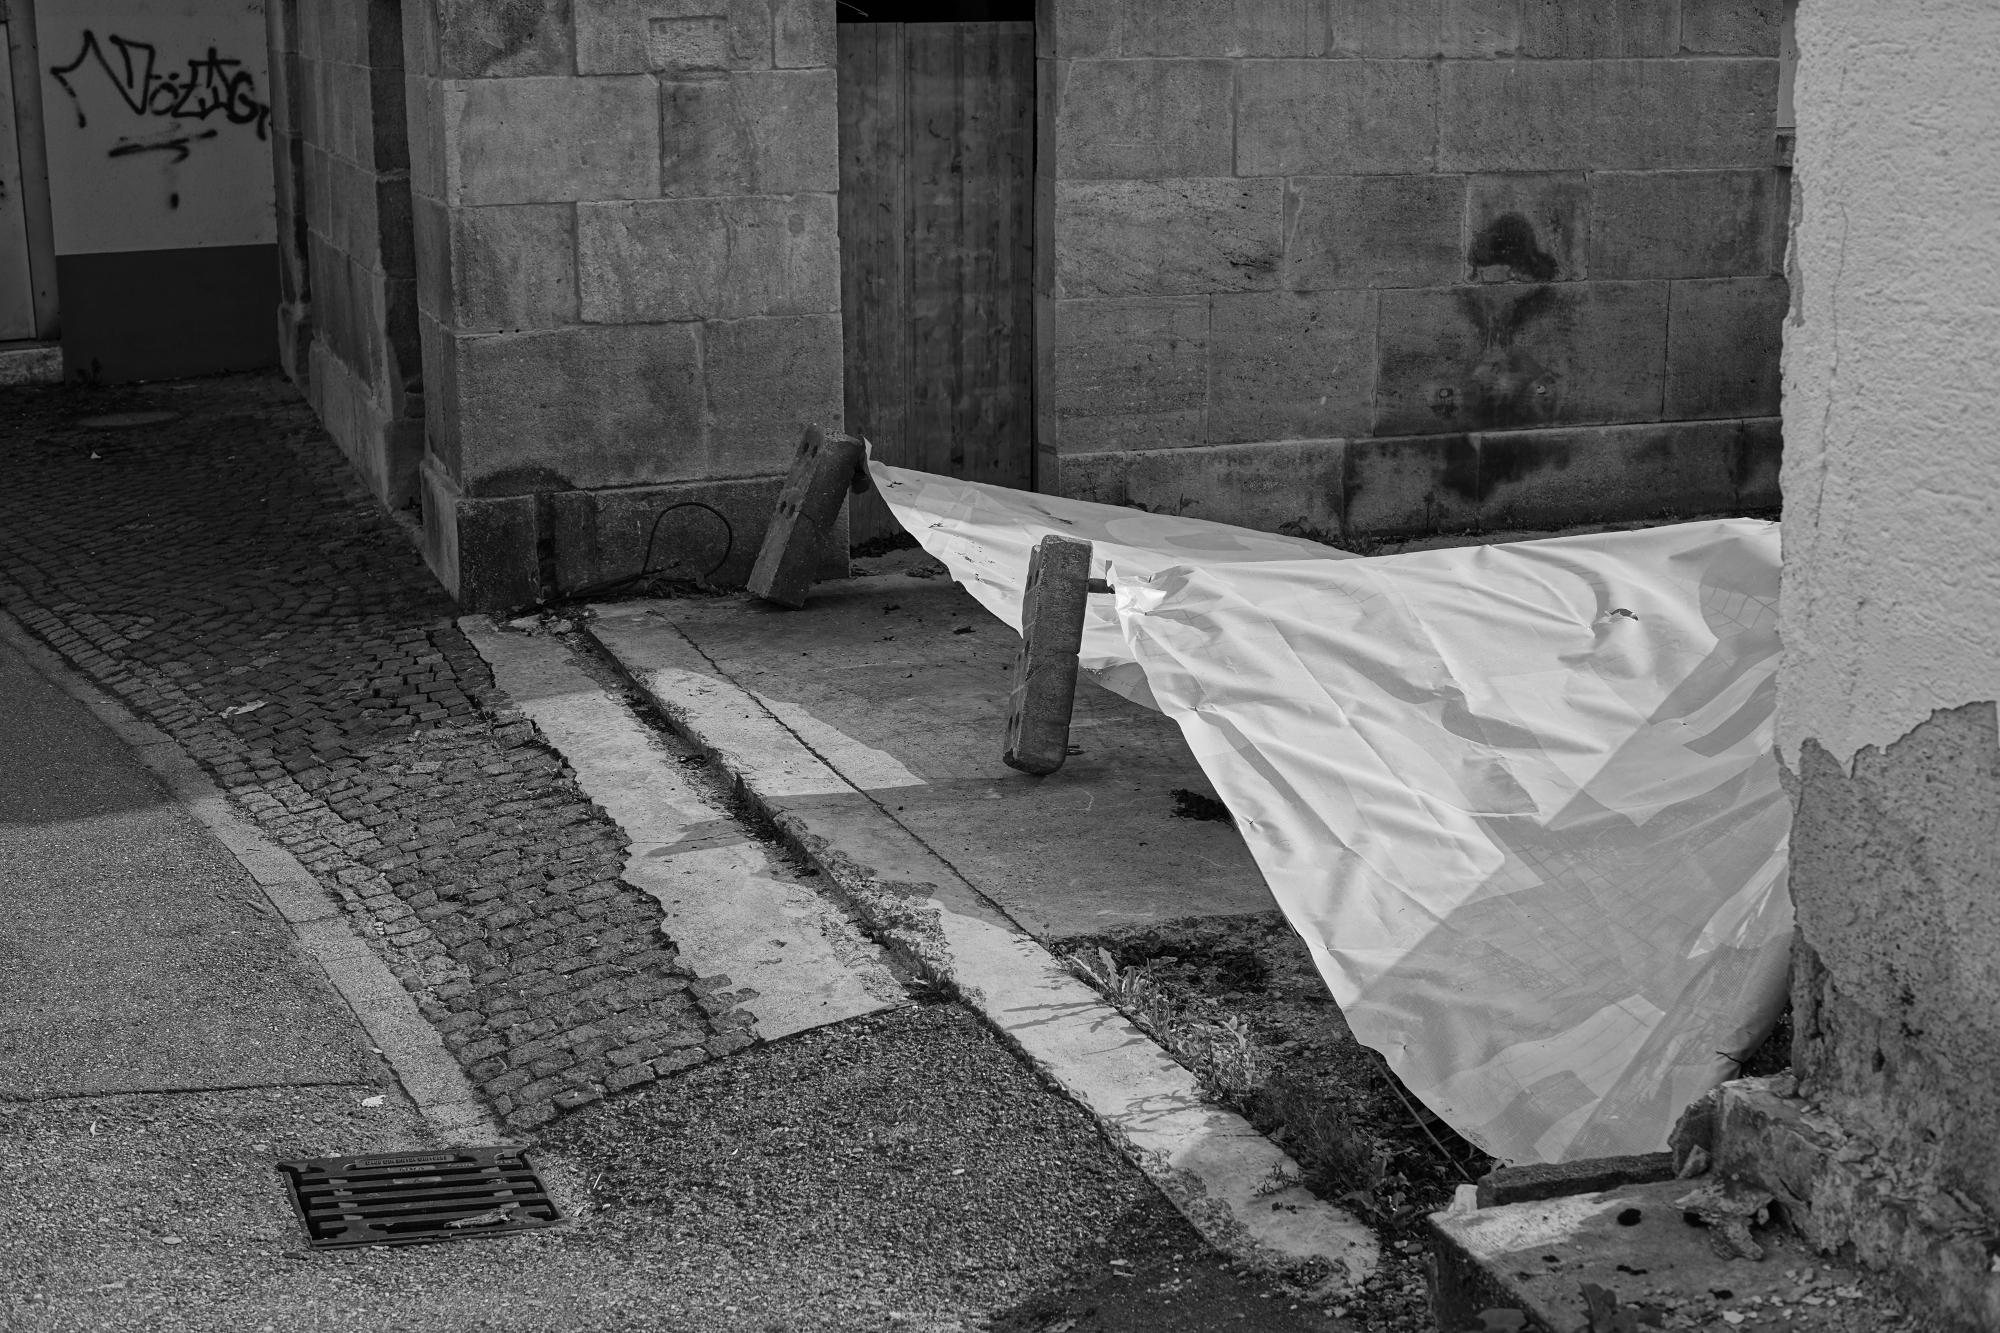 Unintentionally - photography, blackandwhite - marcushammerschmitt | ello